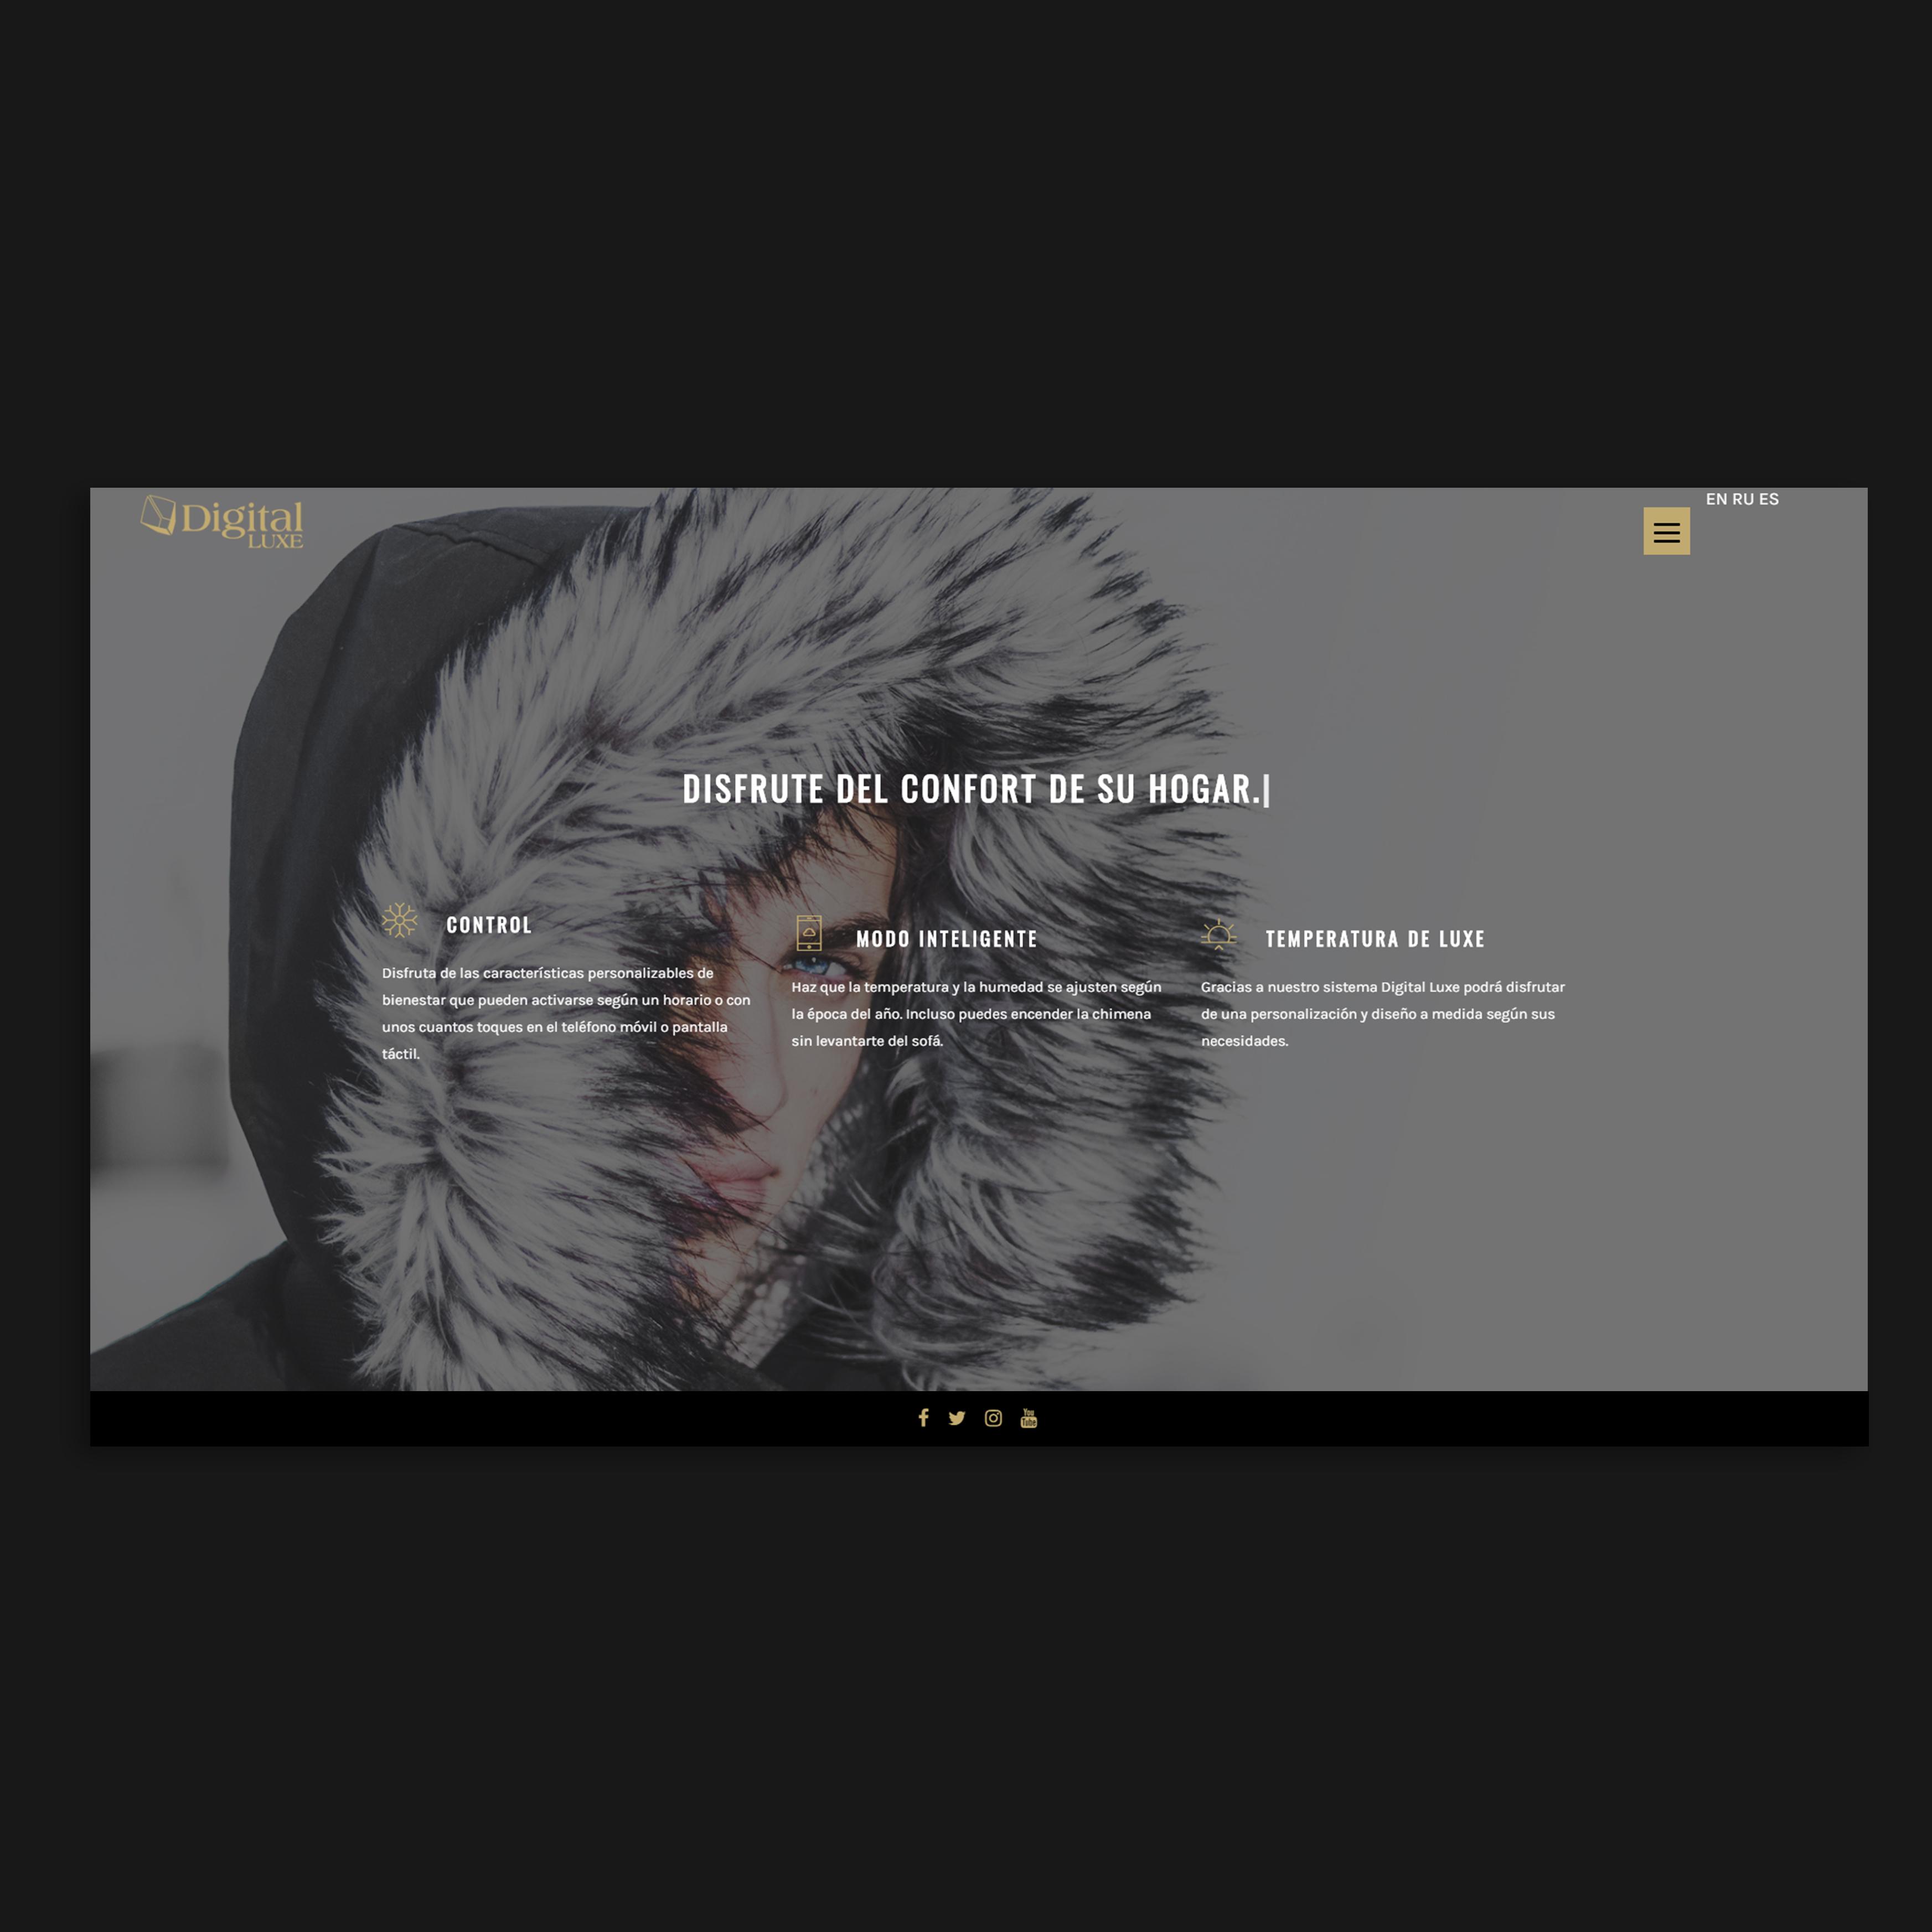 Digital Luxe